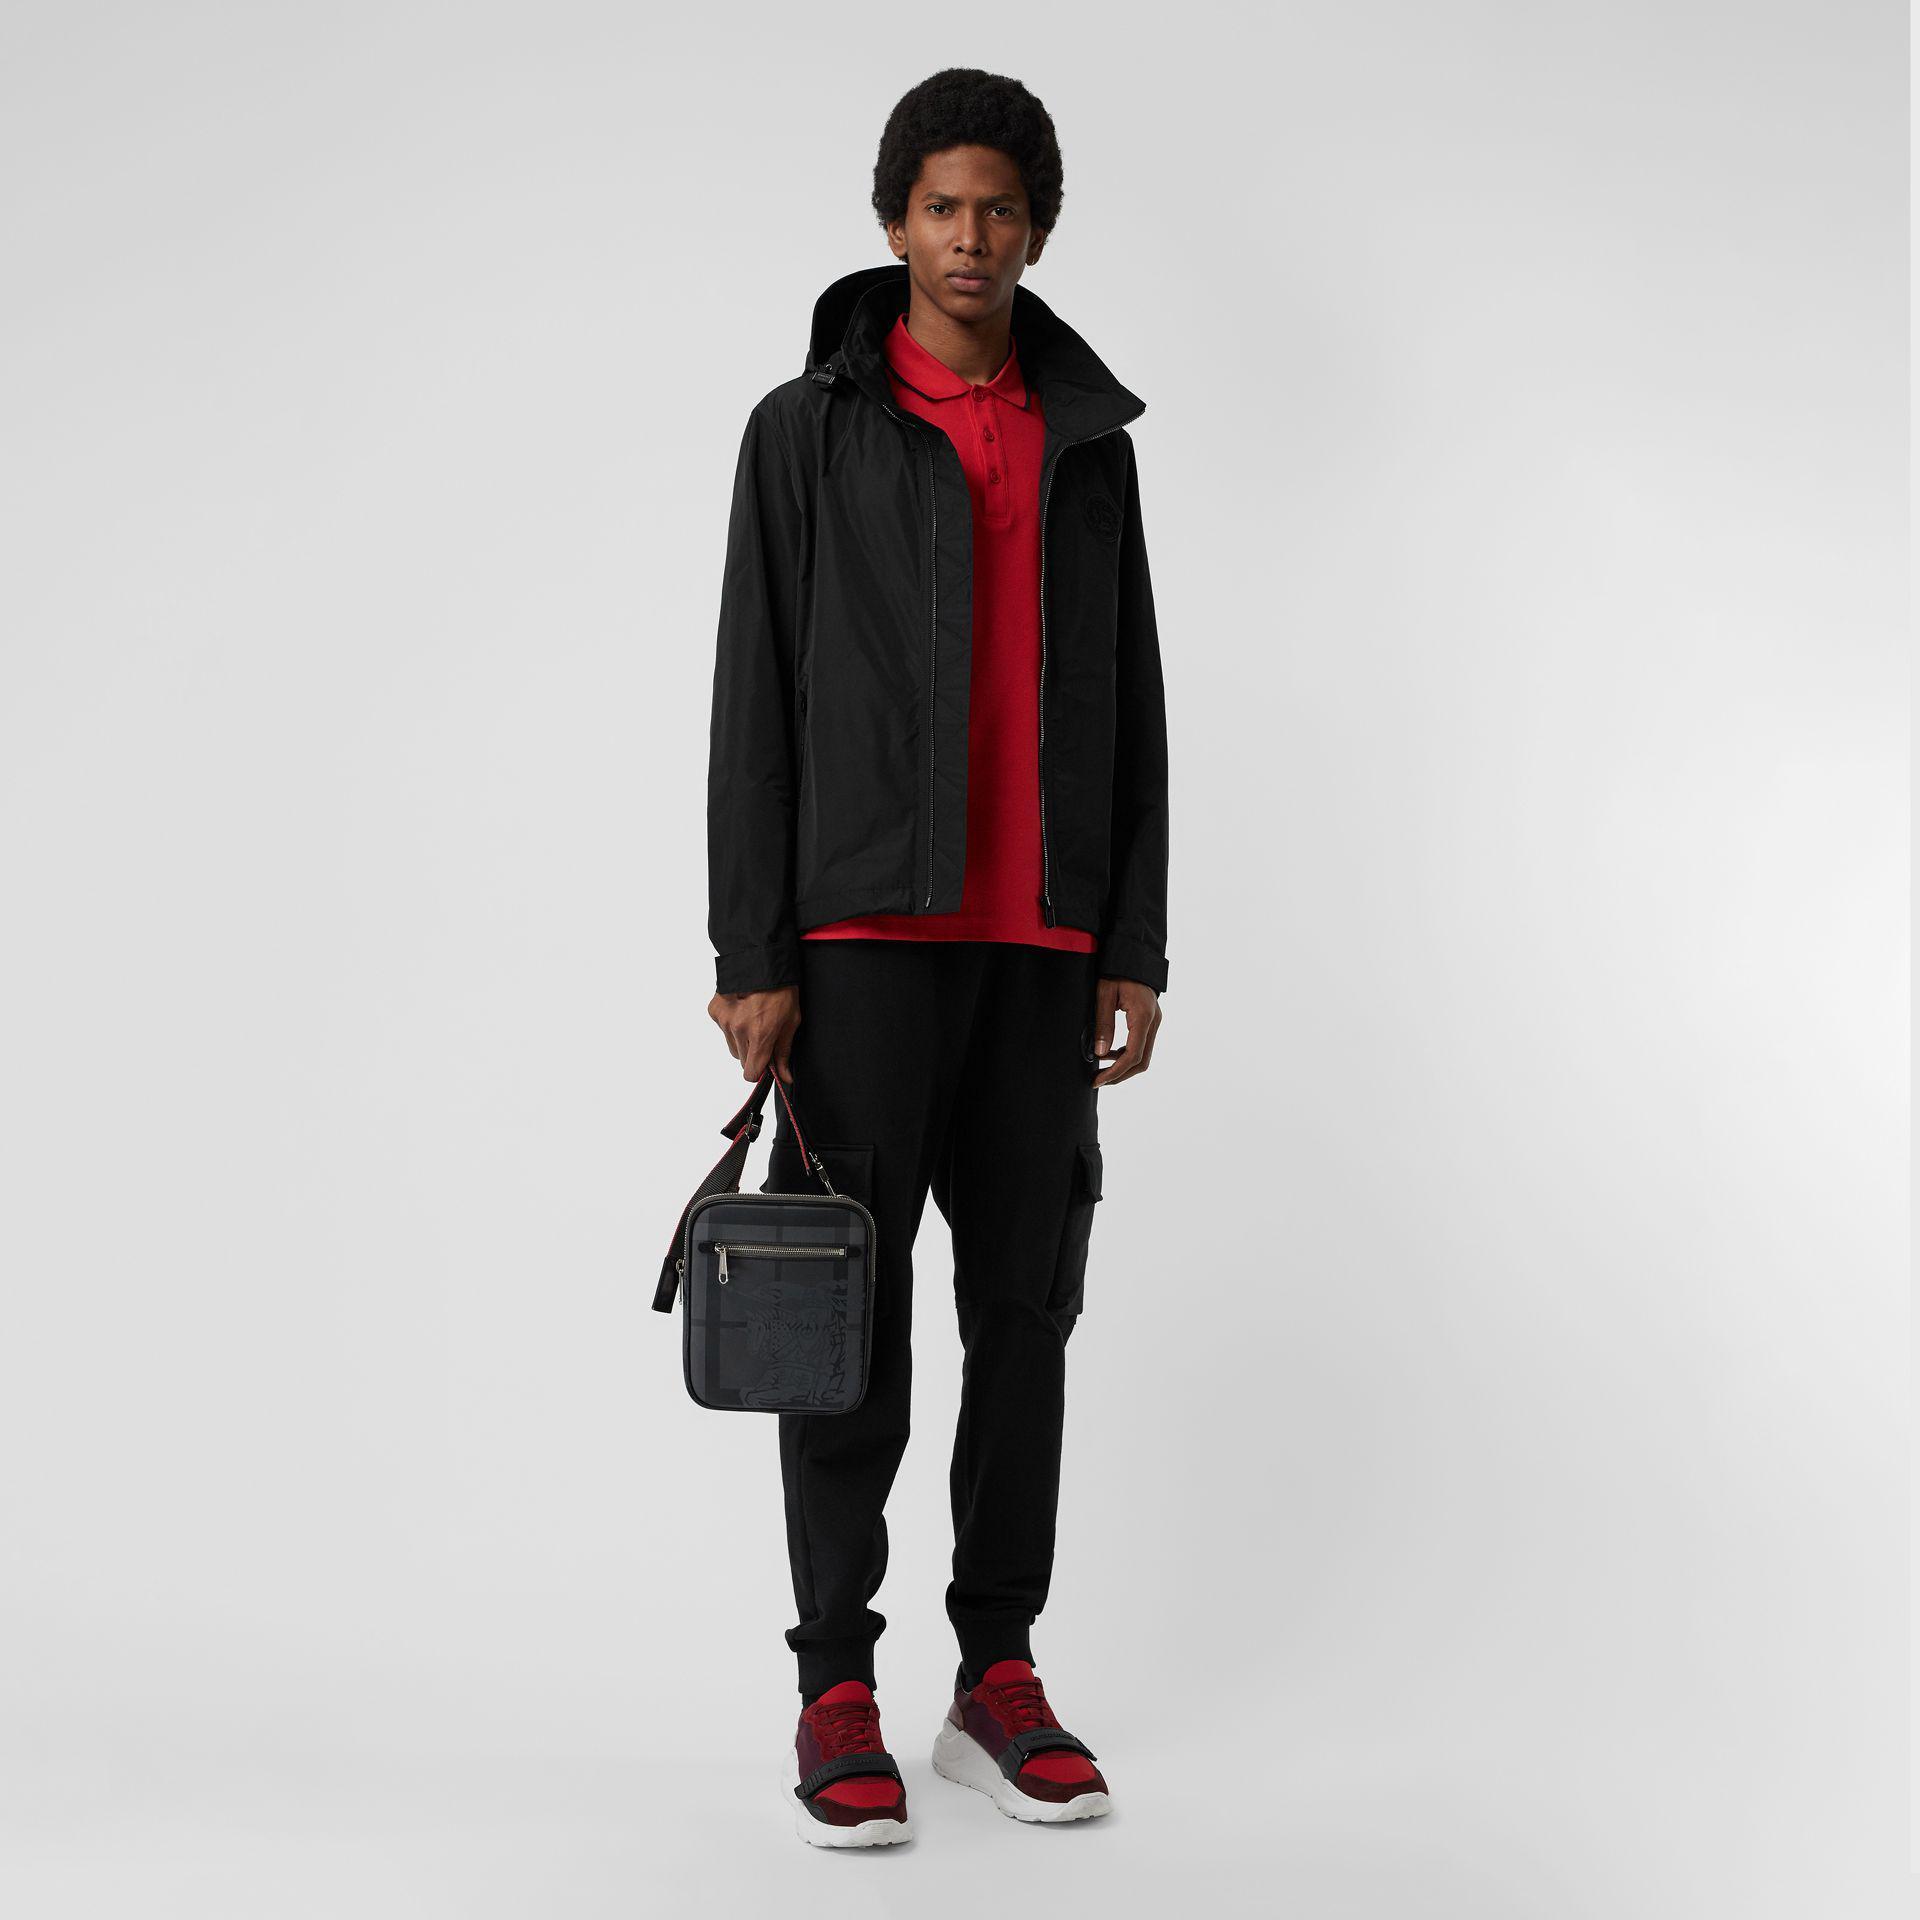 In Hood Black Jacket Shape Burberry Taffeta Packaway Lyst Memory gqOFZCwn